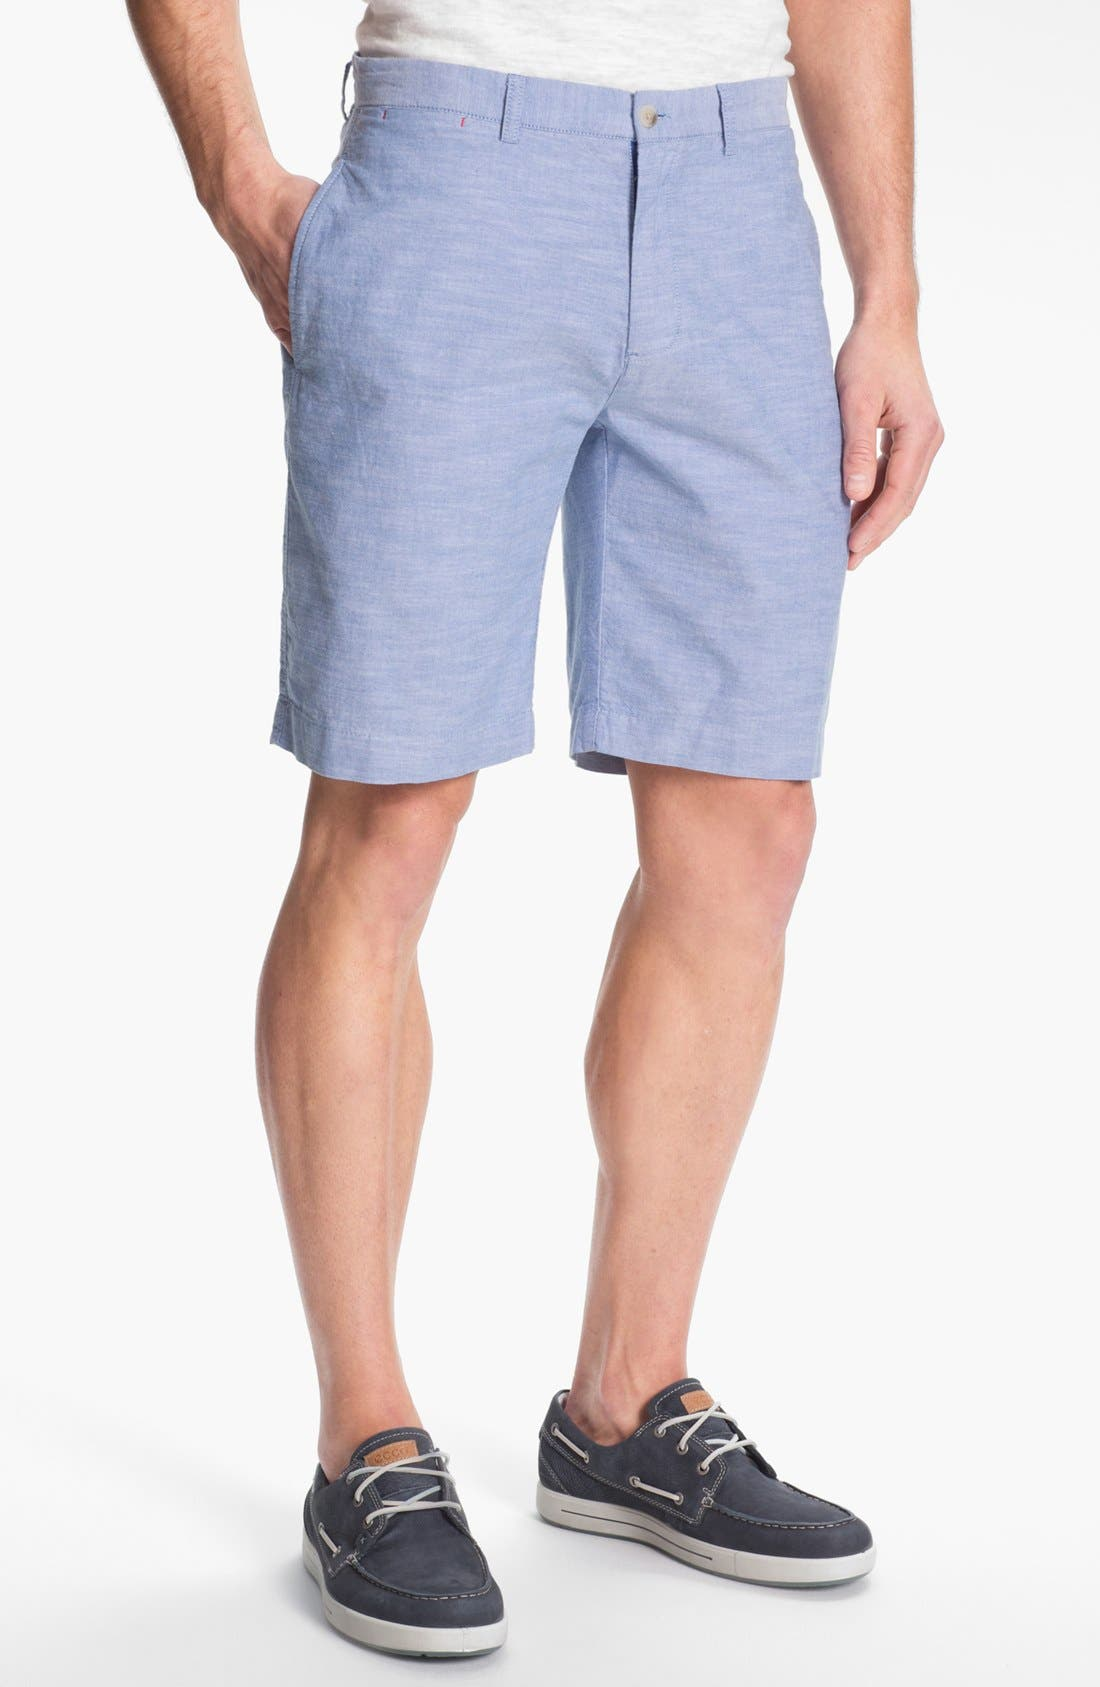 Alternate Image 1 Selected - Maker & Company 'Mucker' Oxford Shorts